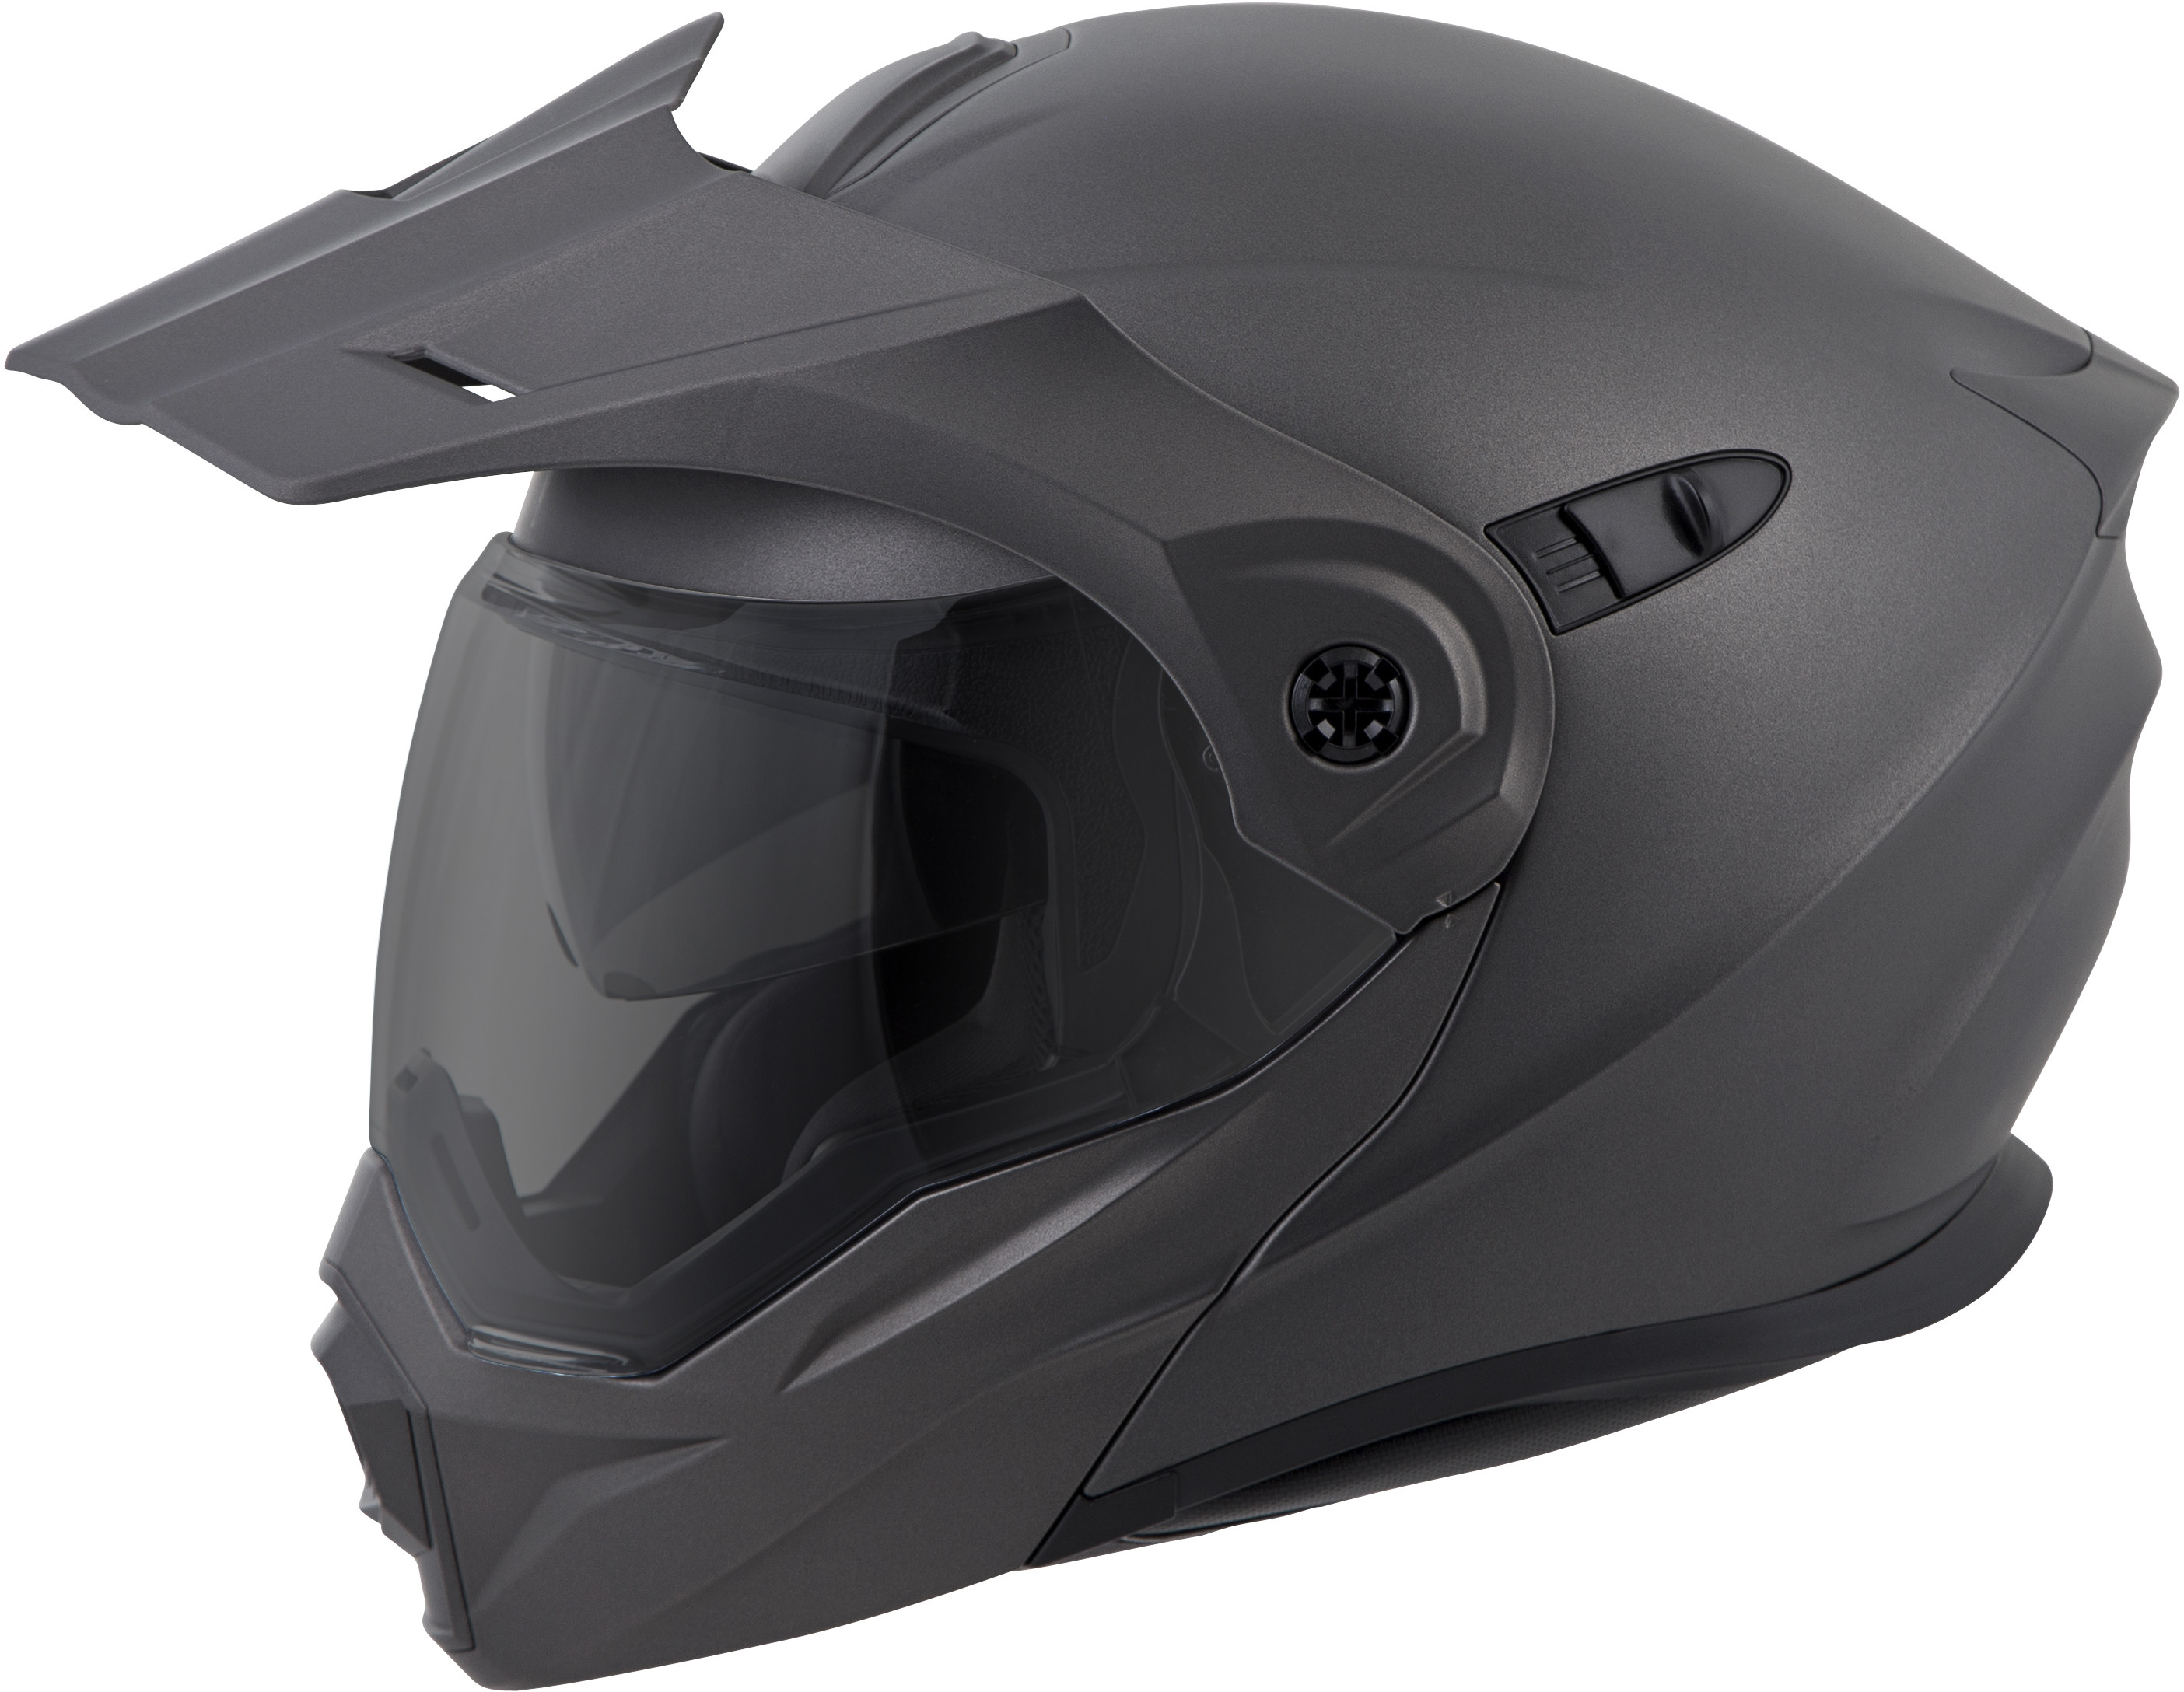 Scorpion-Helmet-EXO-AT950-Solid-Helmet miniature 4